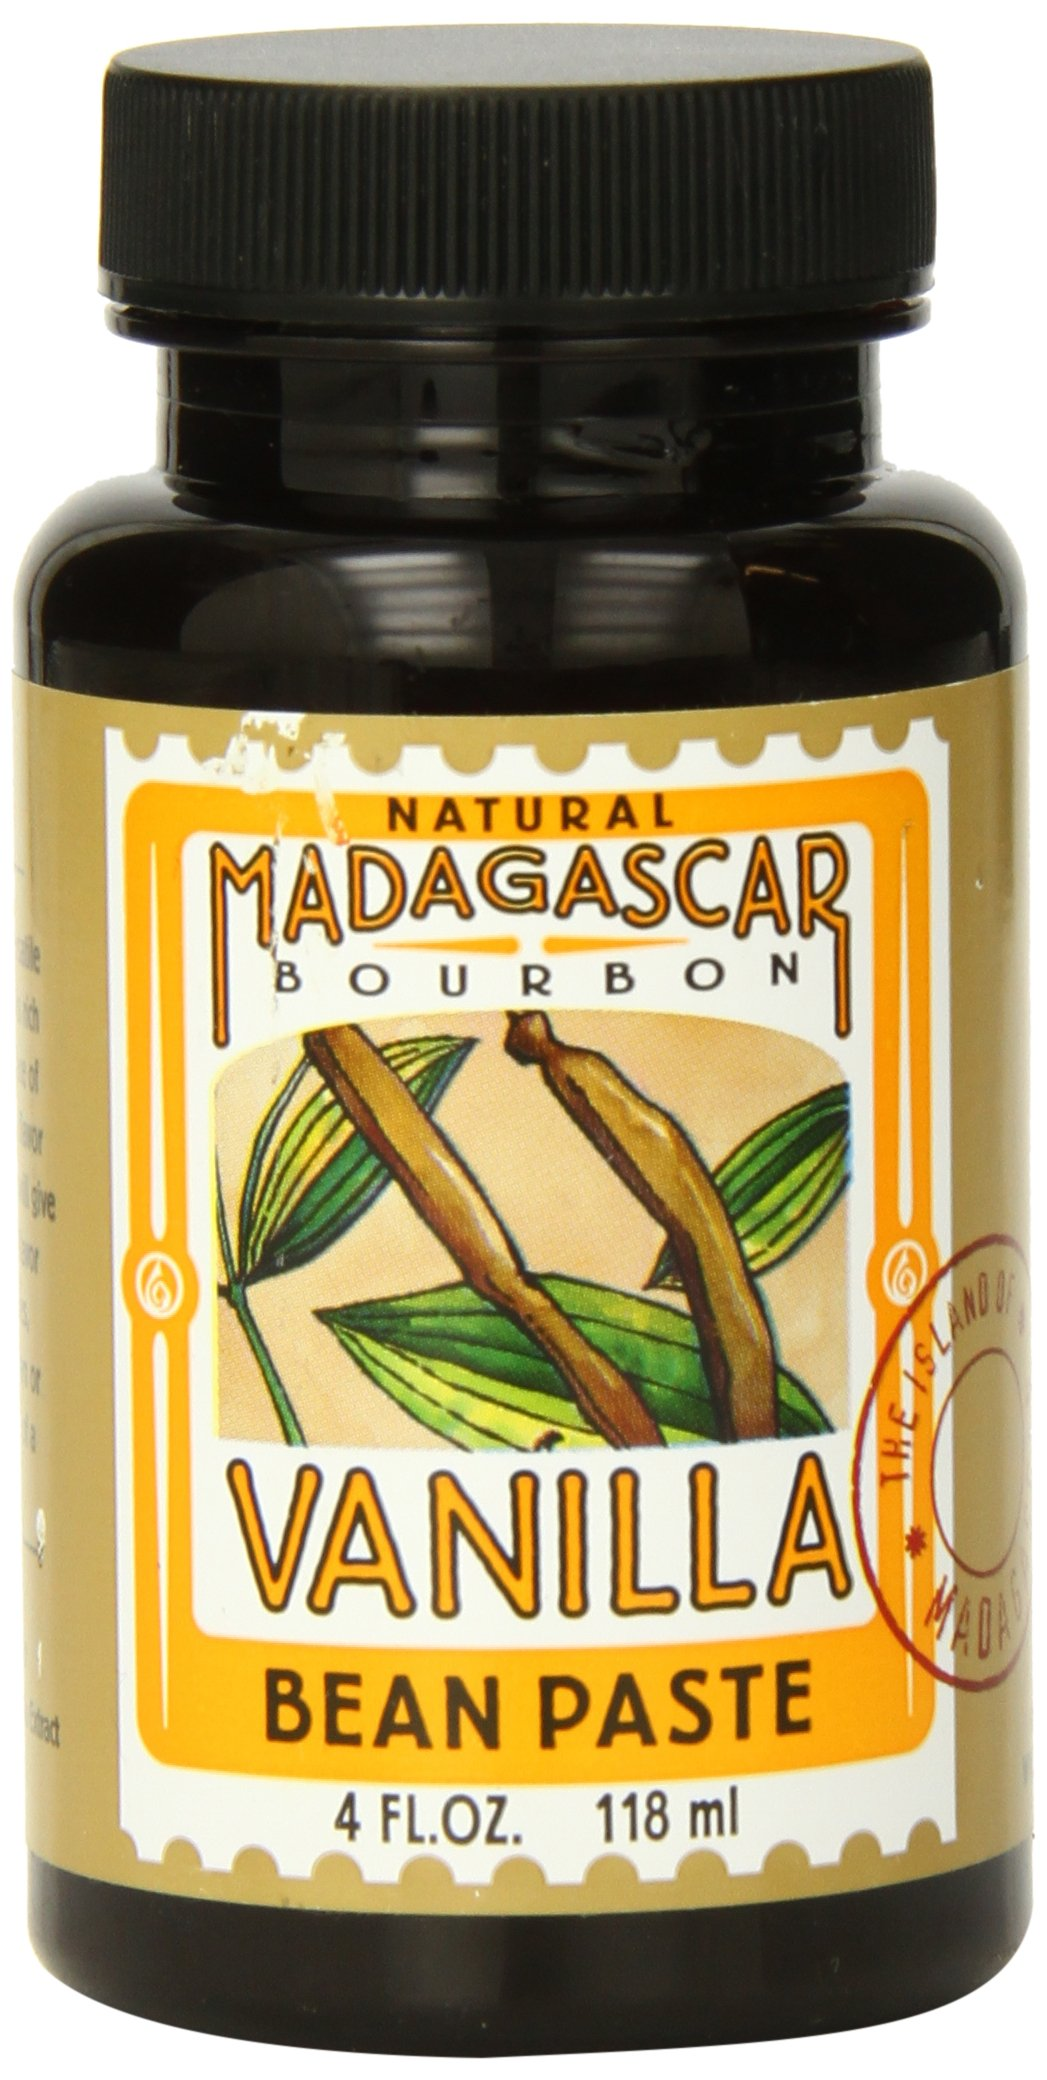 LorAnn Oils Madagascar Vanilla Bean Paste, 4 Ounce by LorAnn